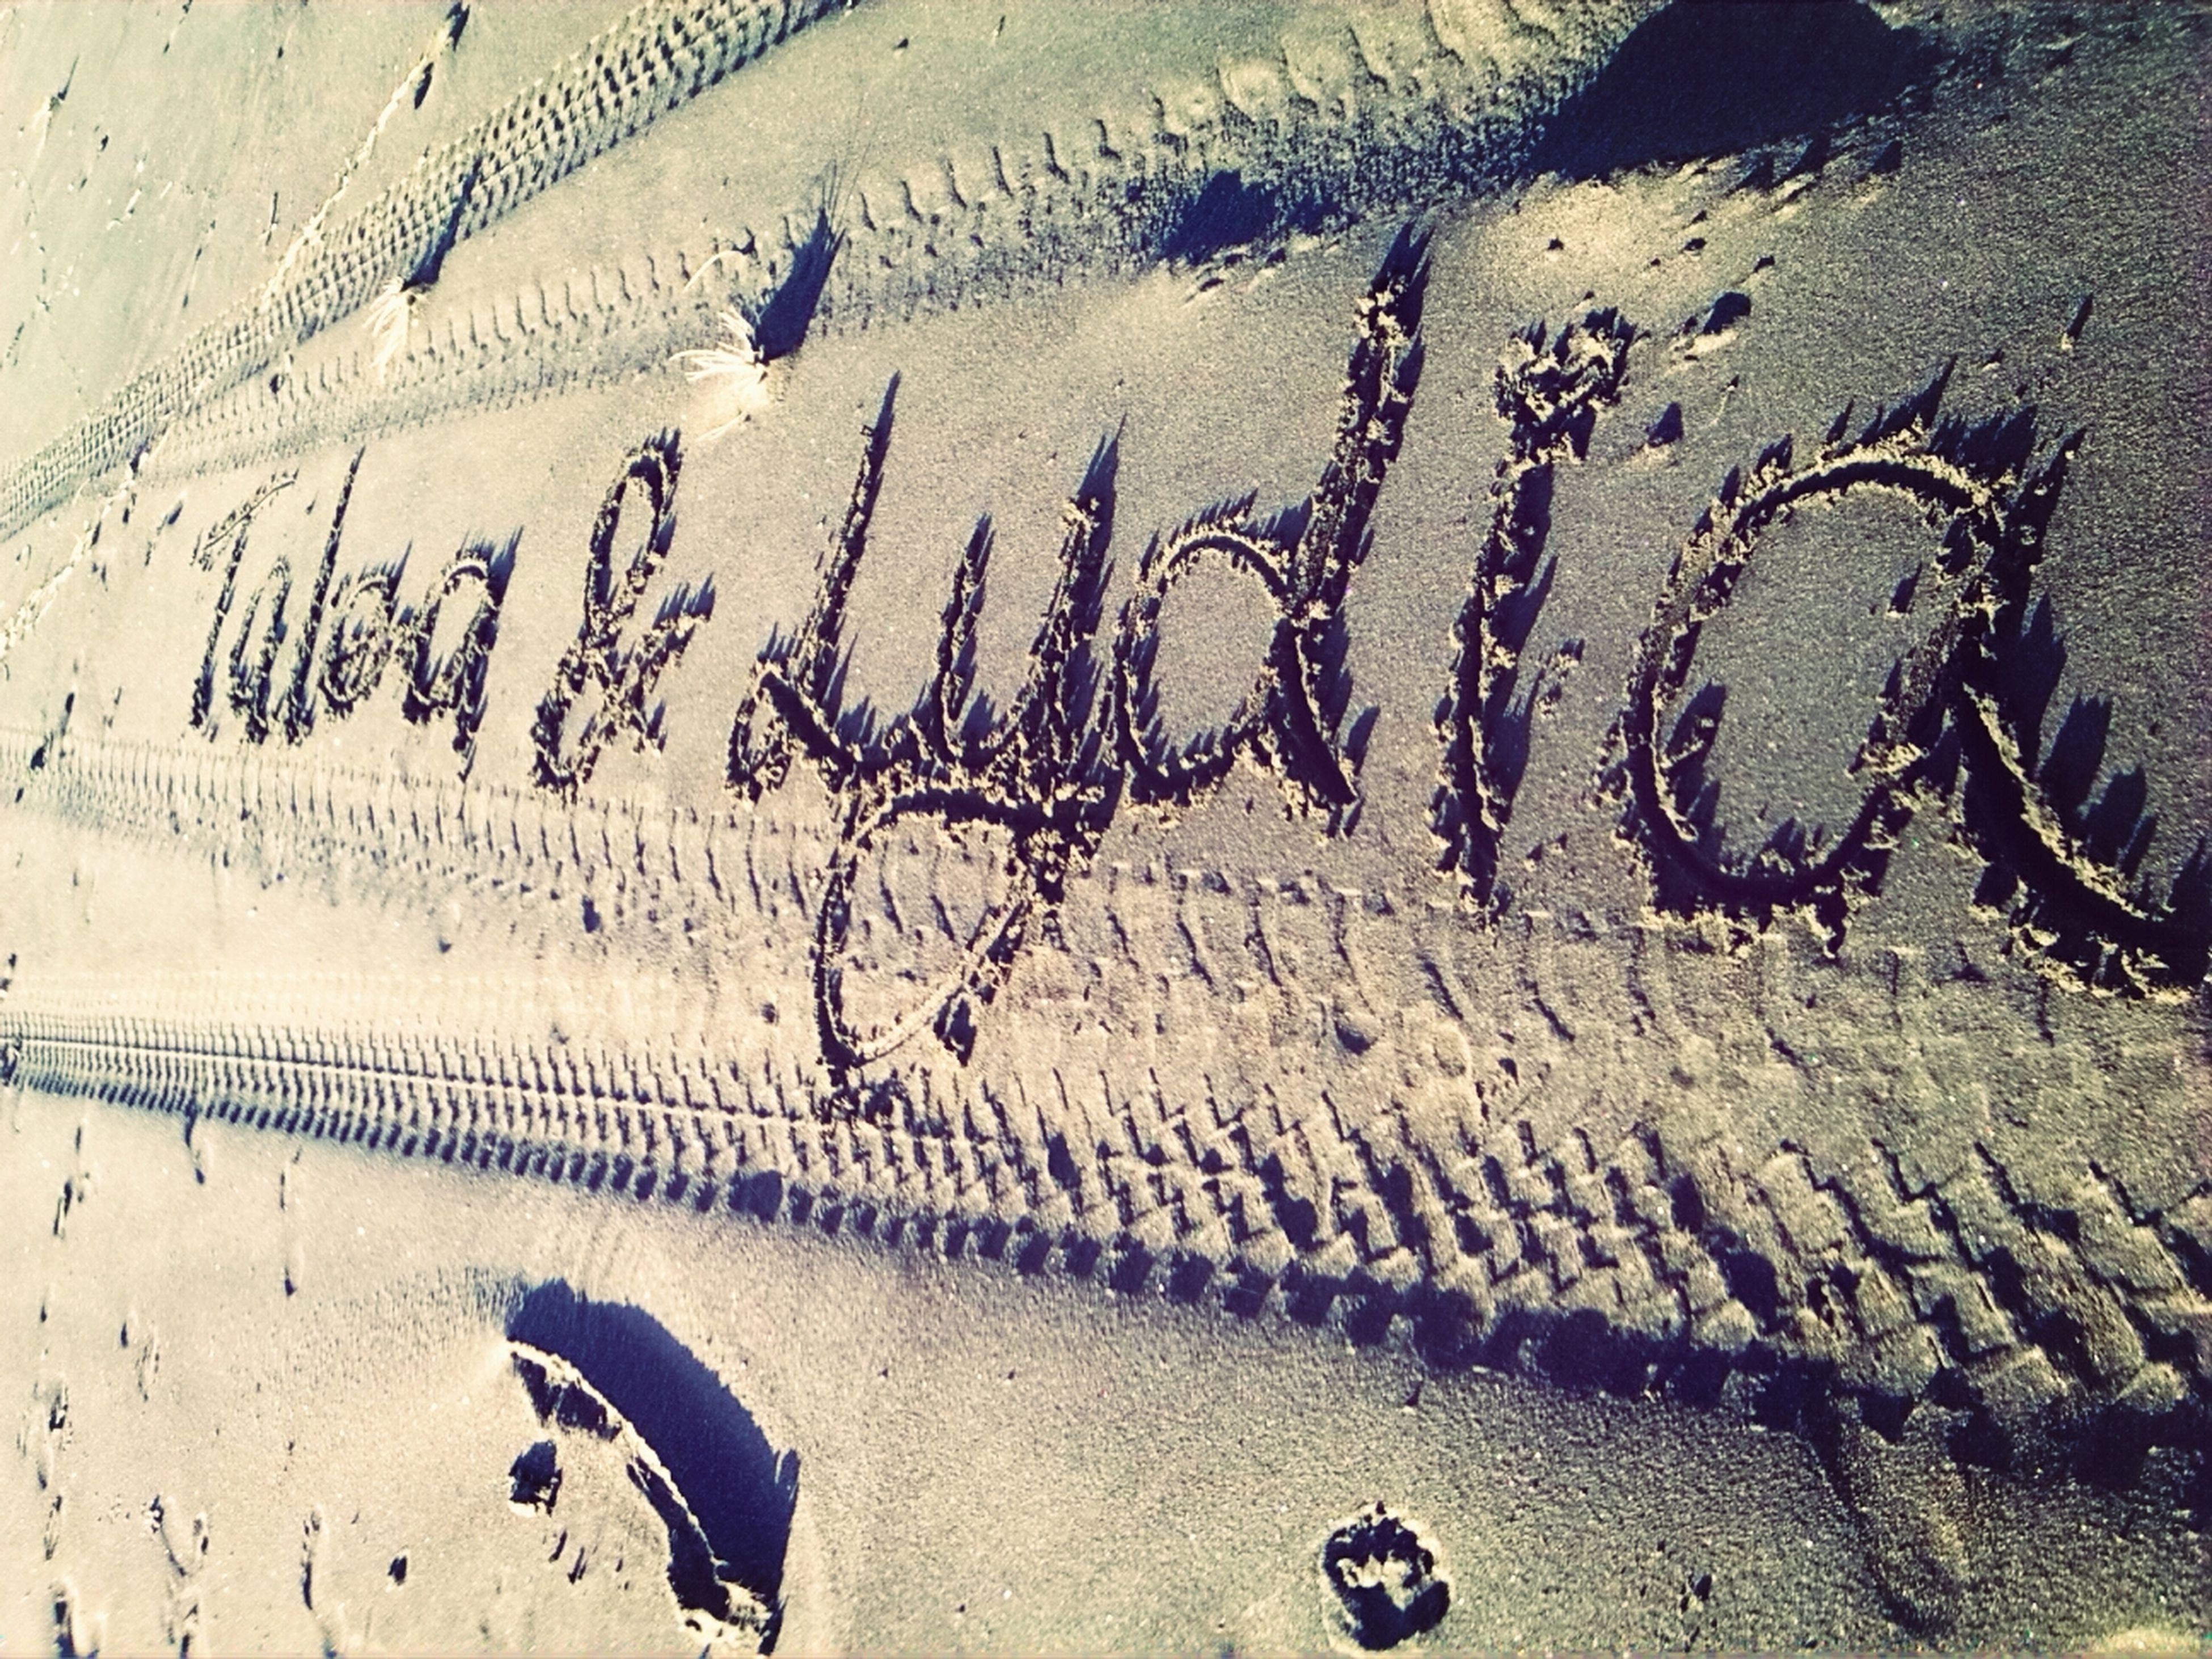 text, sand, western script, graffiti, wall - building feature, communication, beach, high angle view, footprint, day, textured, outdoors, wall, shadow, sunlight, no people, art, capital letter, street, creativity